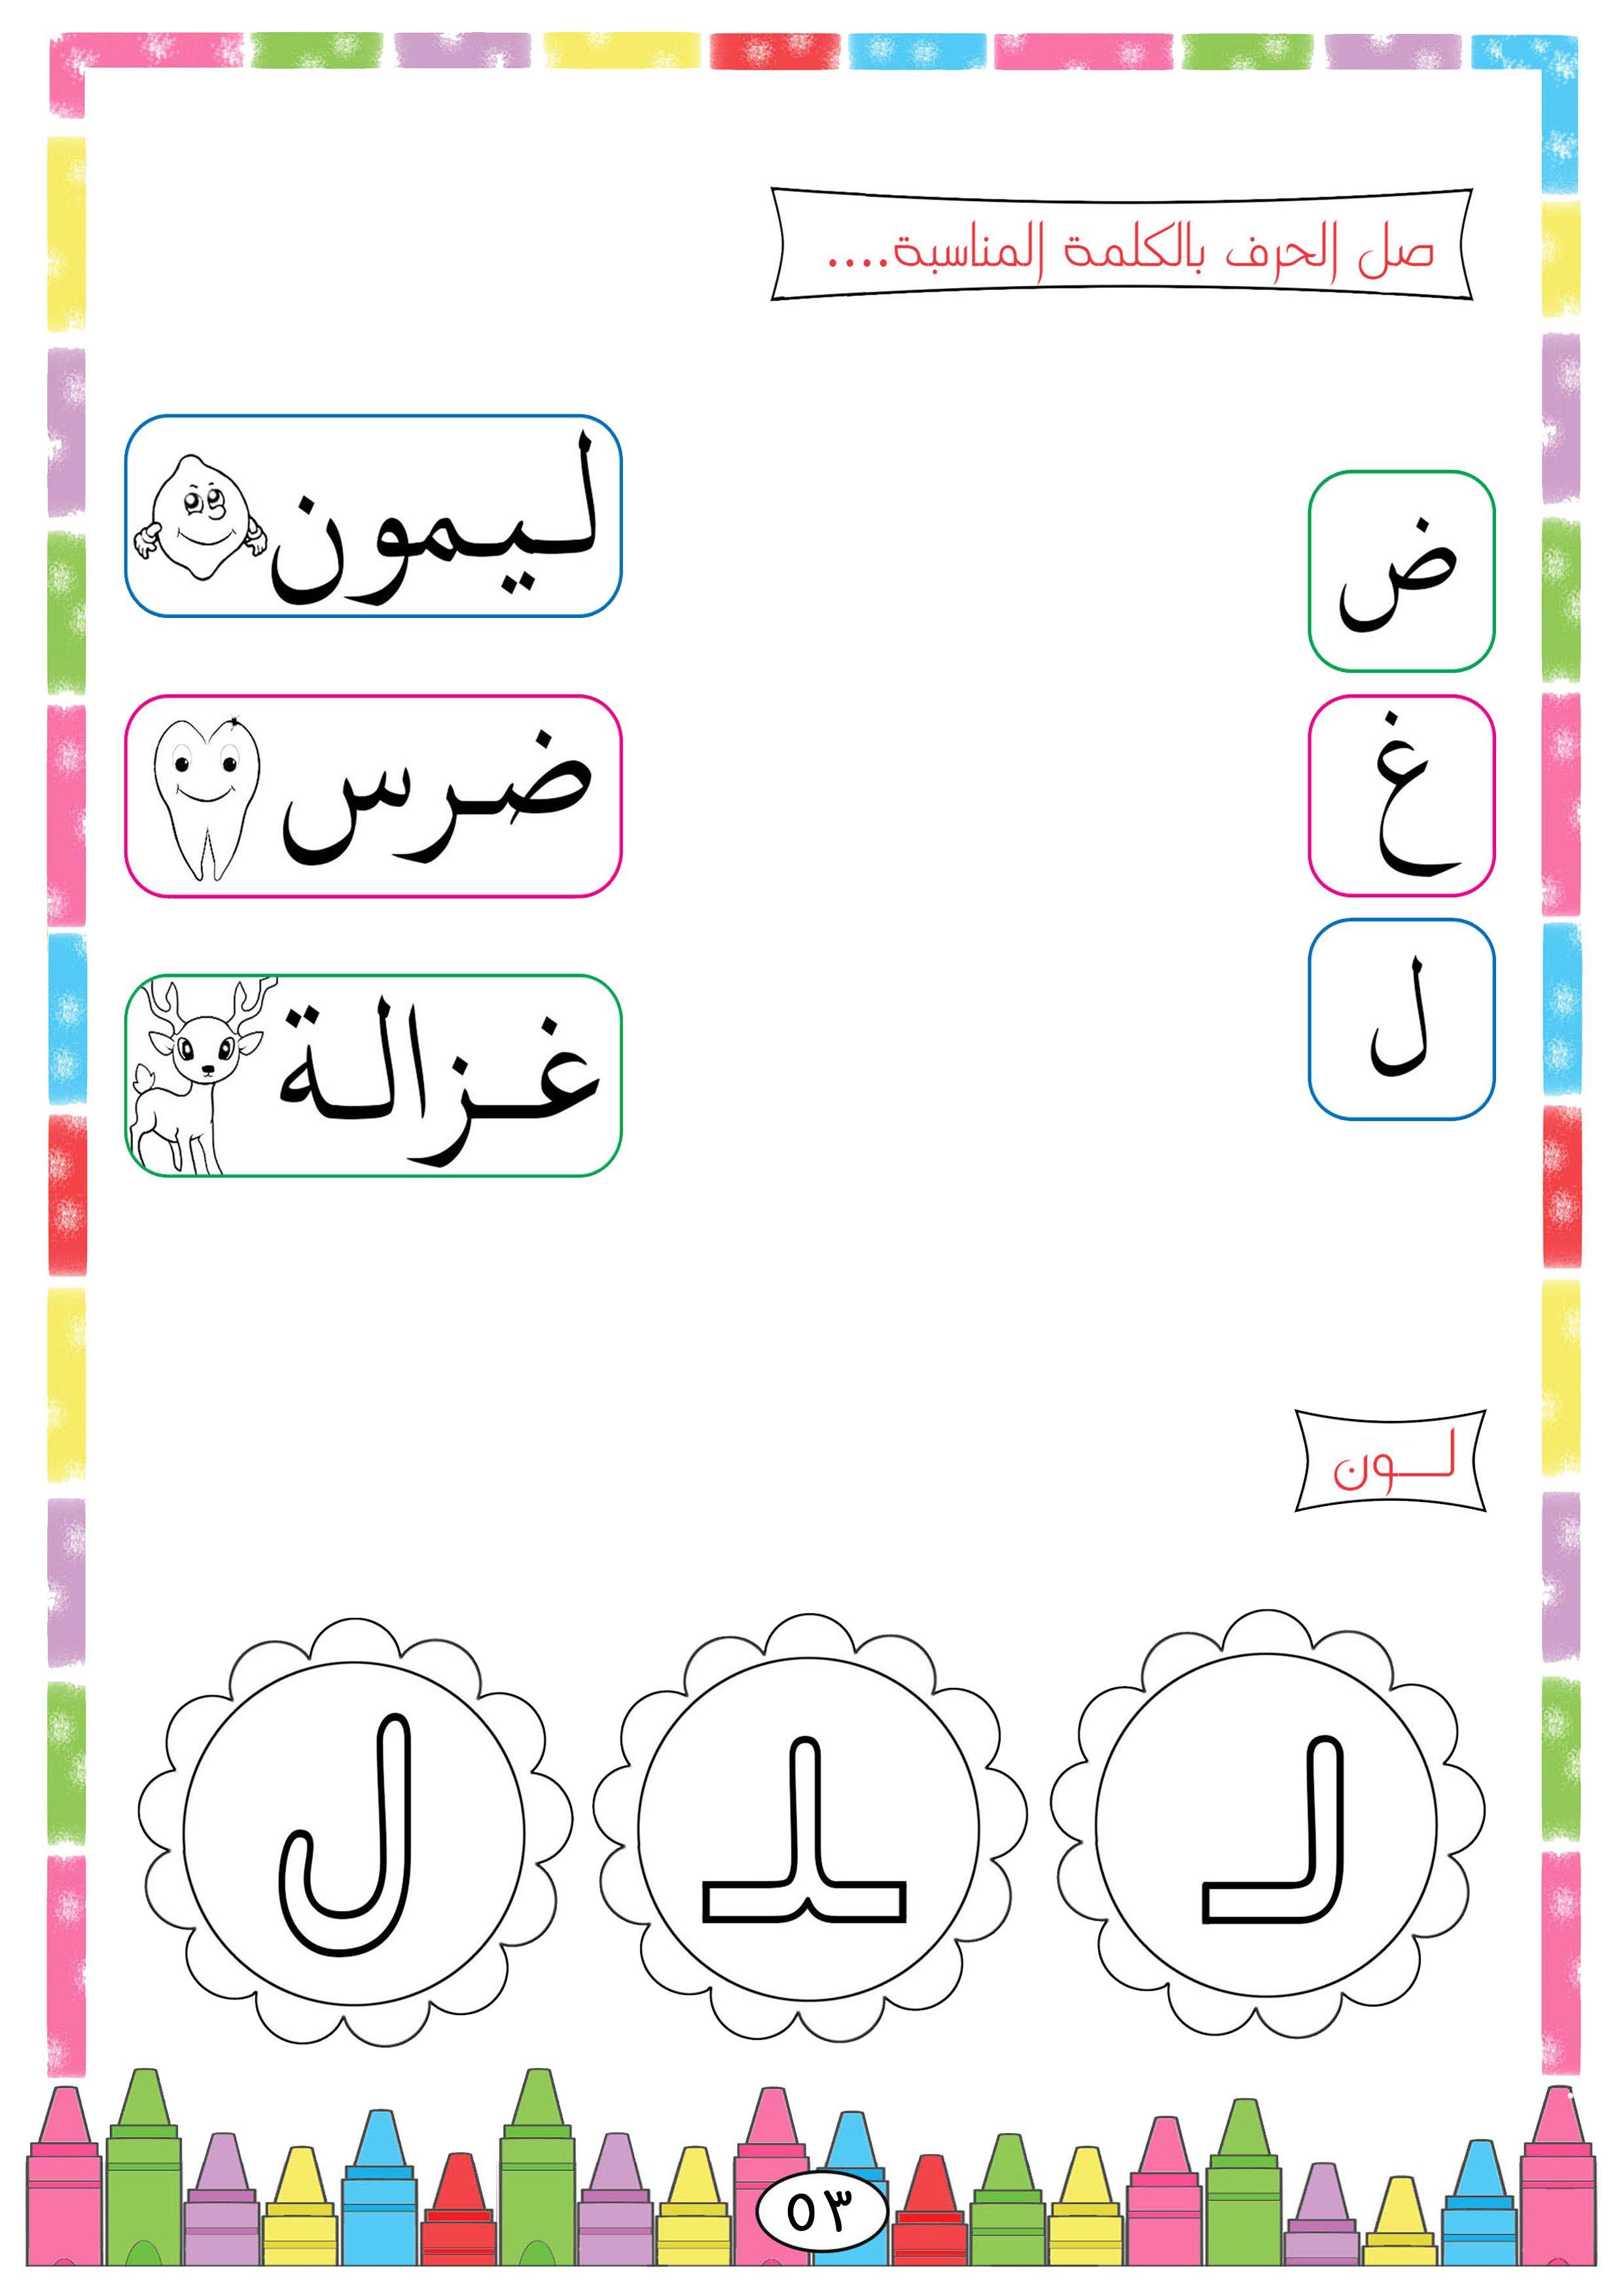 arabic arap a reniyorum learning arabic arabic lessons learn arabic alphabet. Black Bedroom Furniture Sets. Home Design Ideas